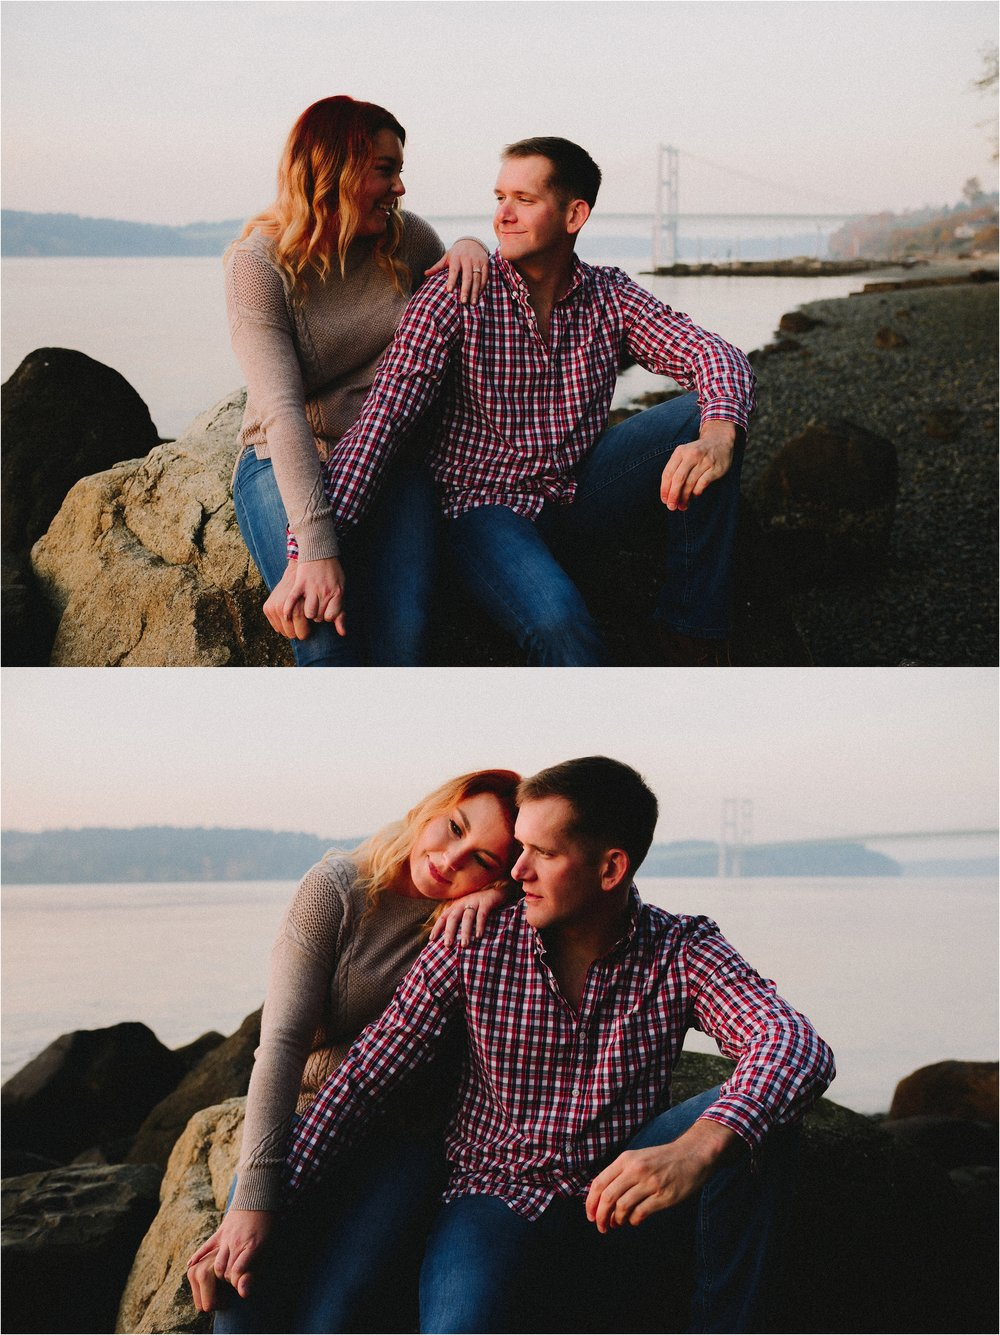 titlow-beach-park-engagement-session-jannicka-mayte-anchorage-alaska-wedding-photographer_0028.jpg